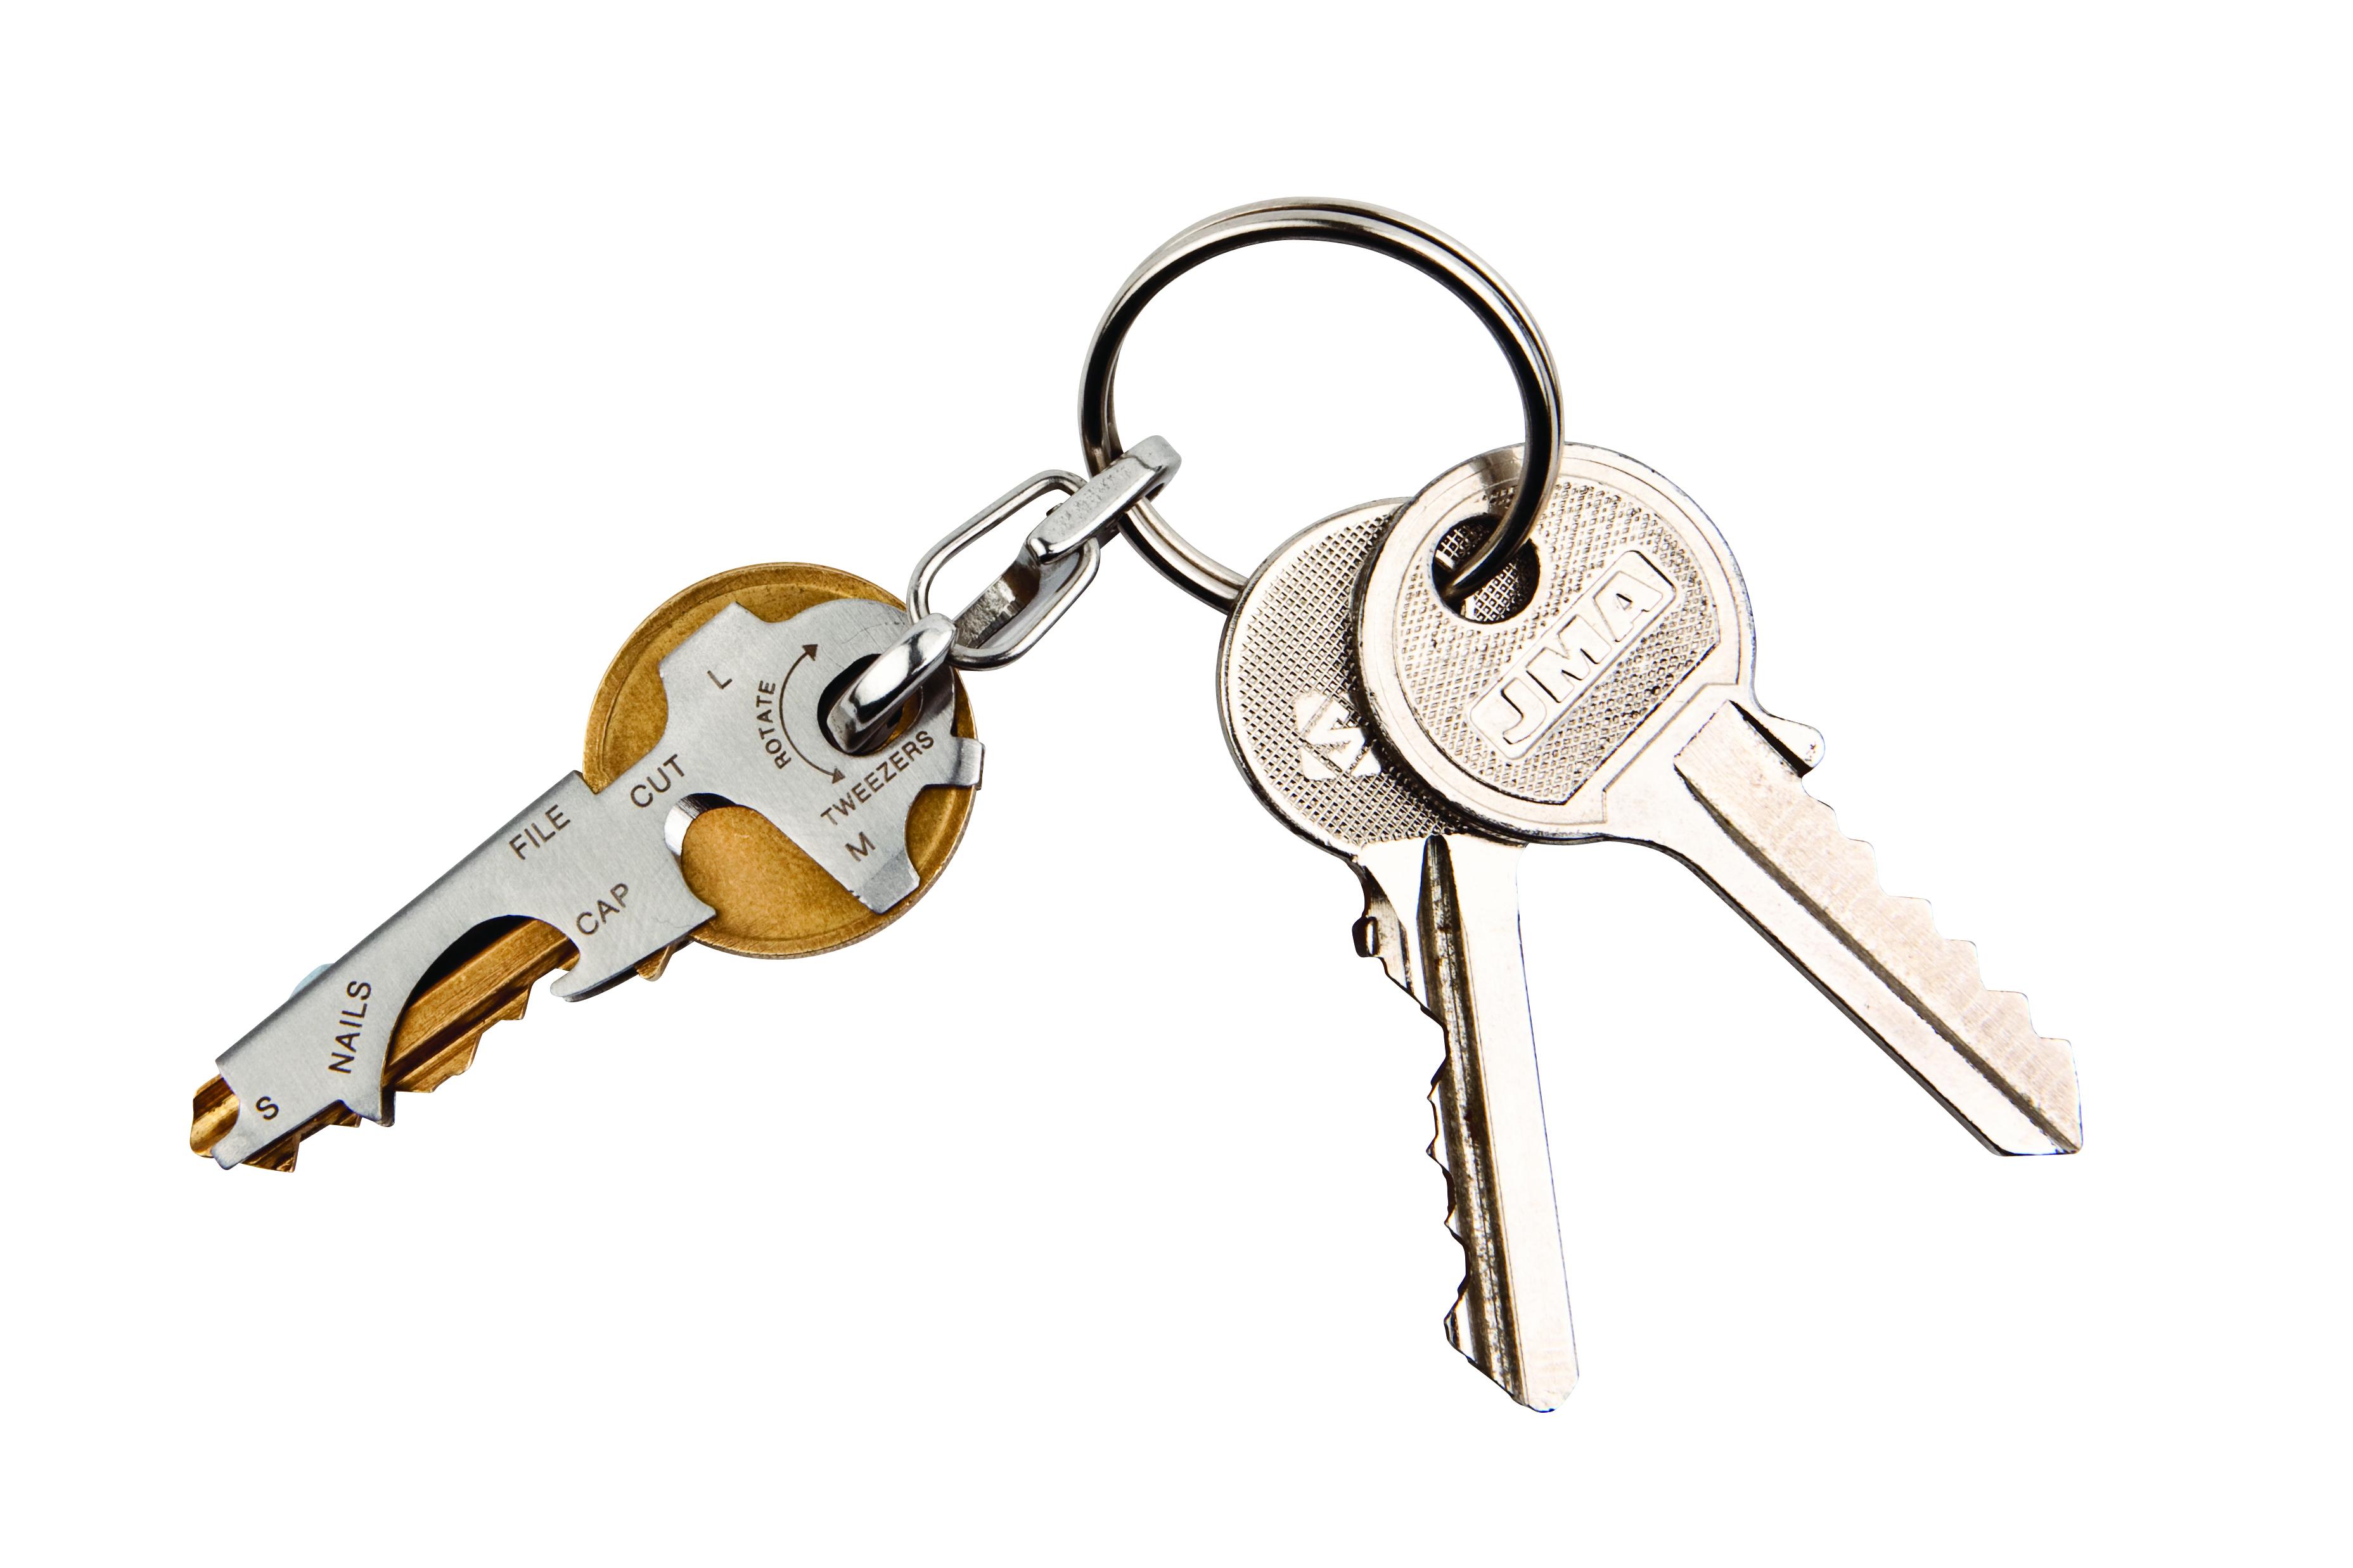 N na klíč - Nářadí na klíč